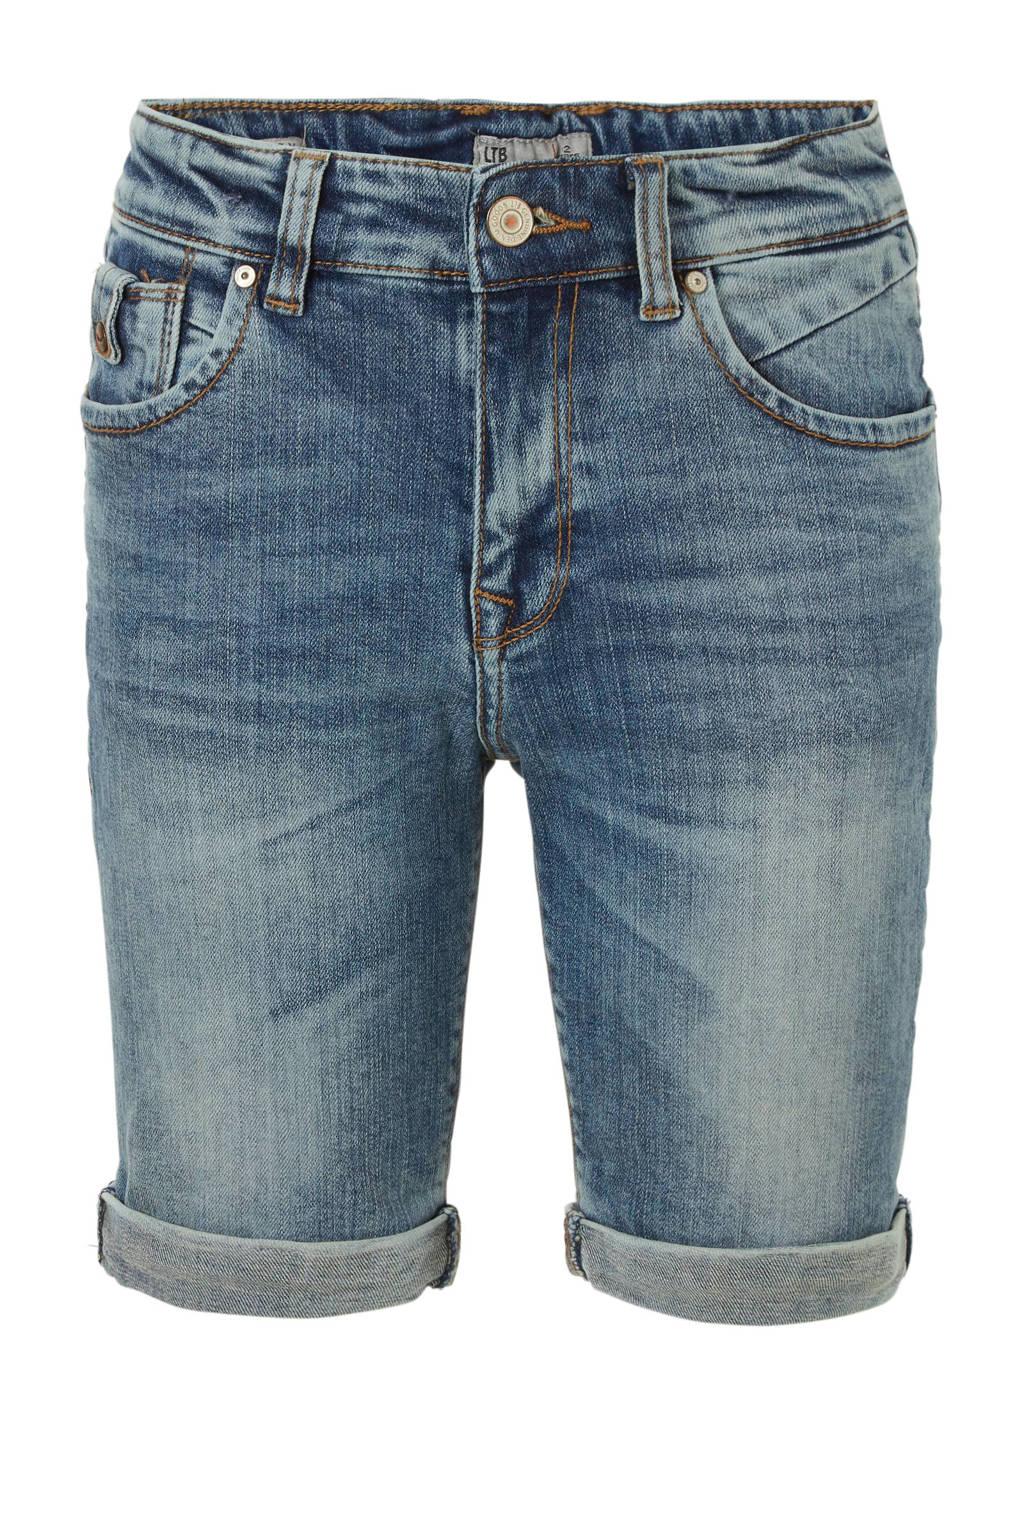 LTB jeans bermuda Anders laredo wash, Laredo wash